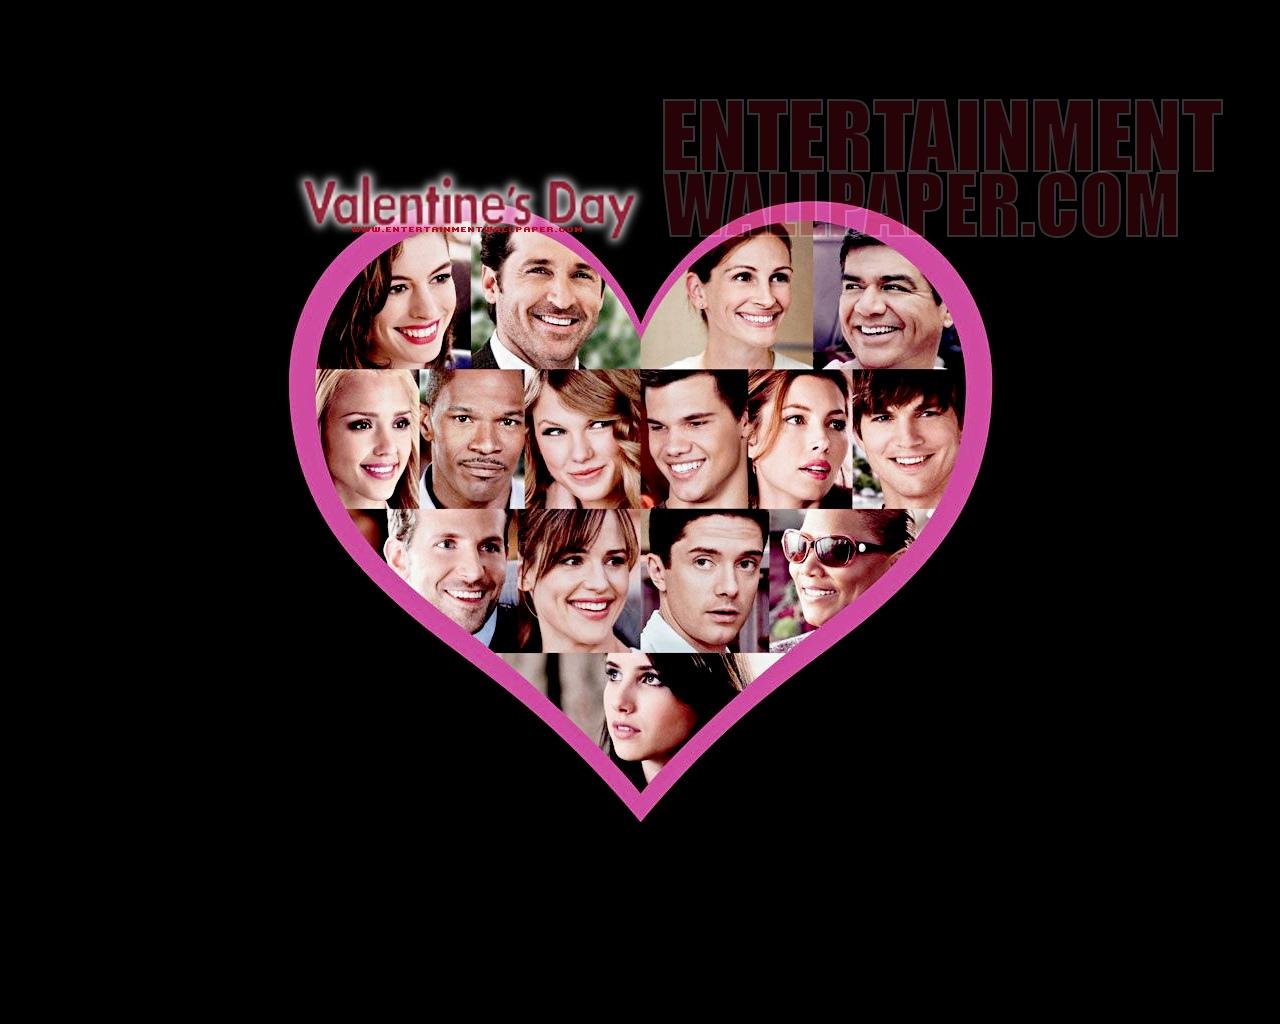 Random Wallpapers Valentine S Day Wallpaper 2012 Origin Of